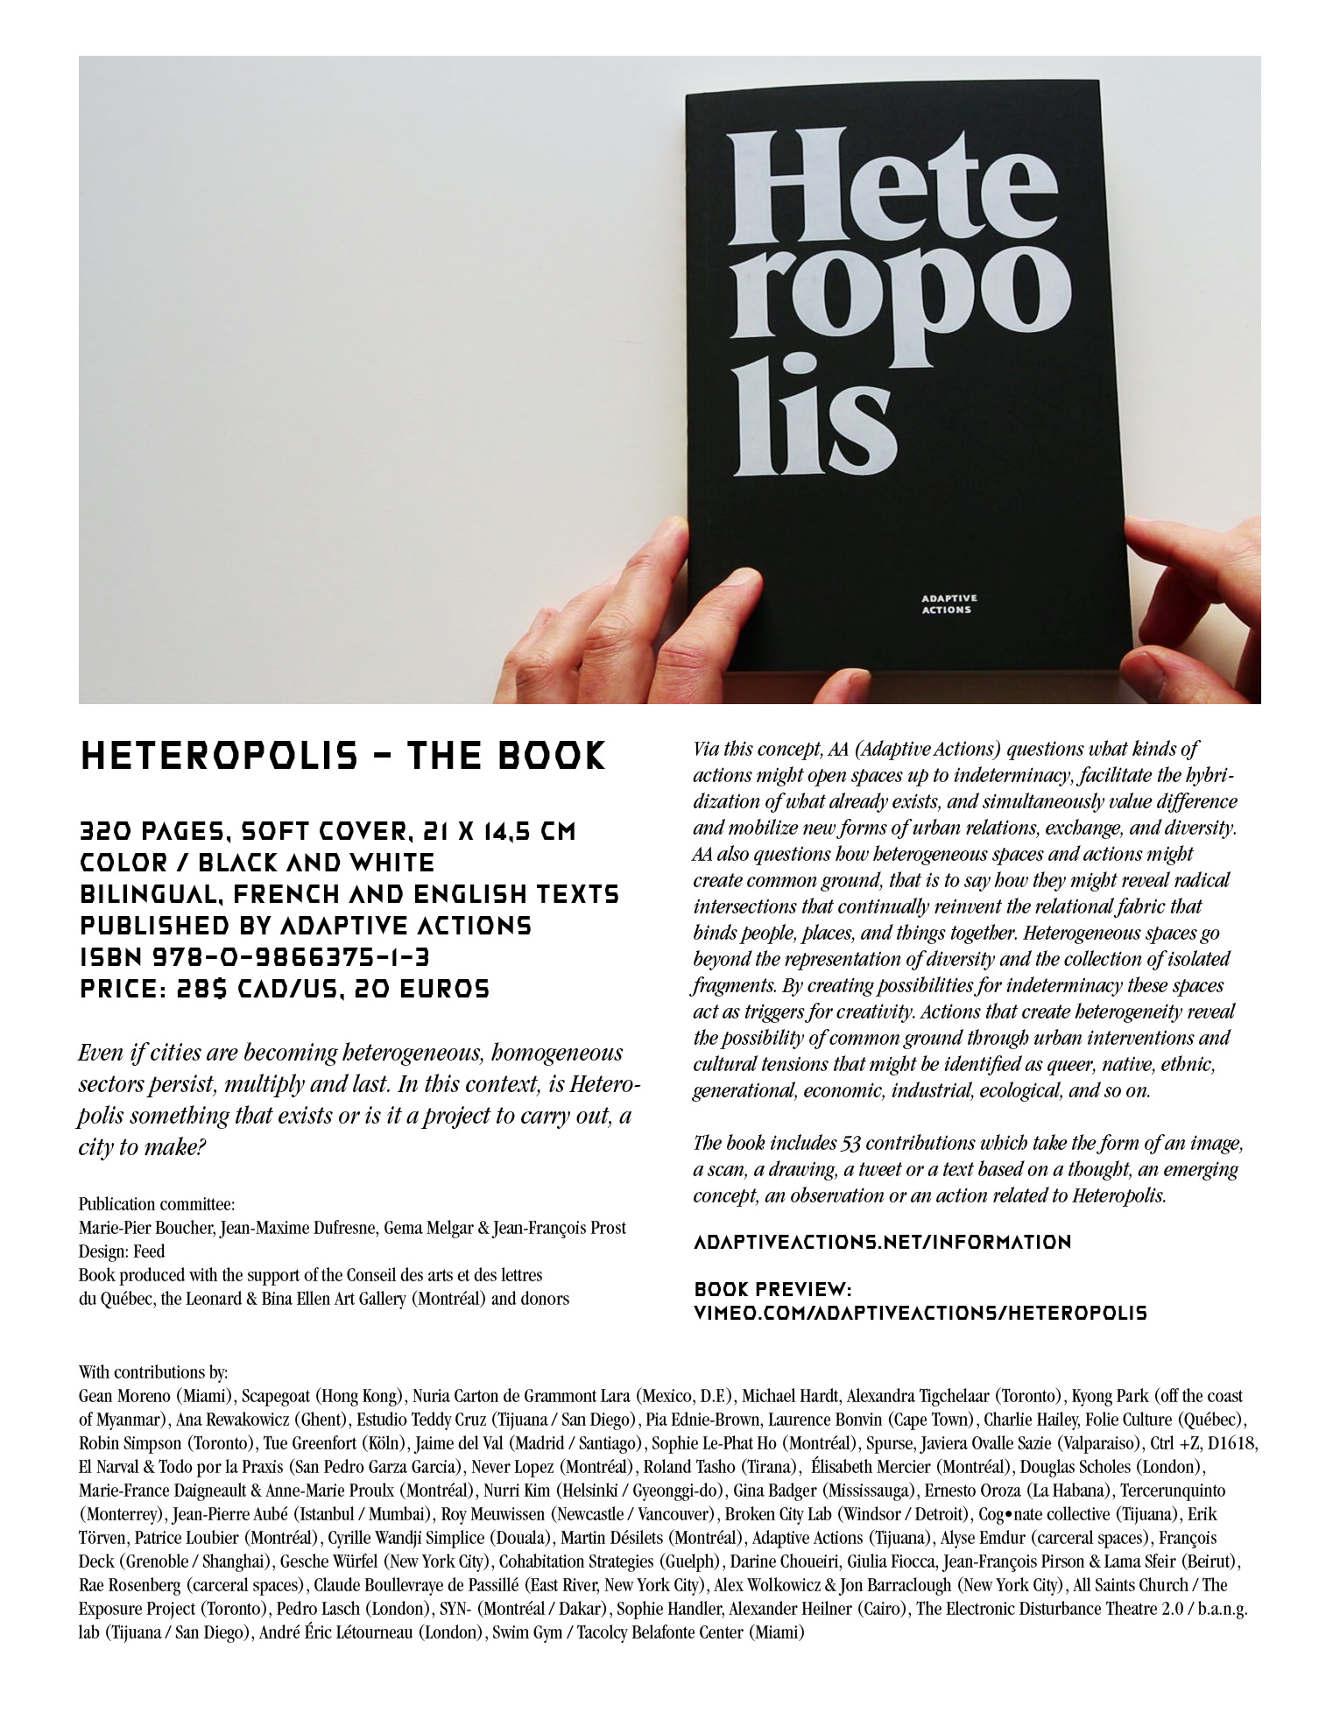 Heteropolis Le Livre The Book 2013 Jean Maxime